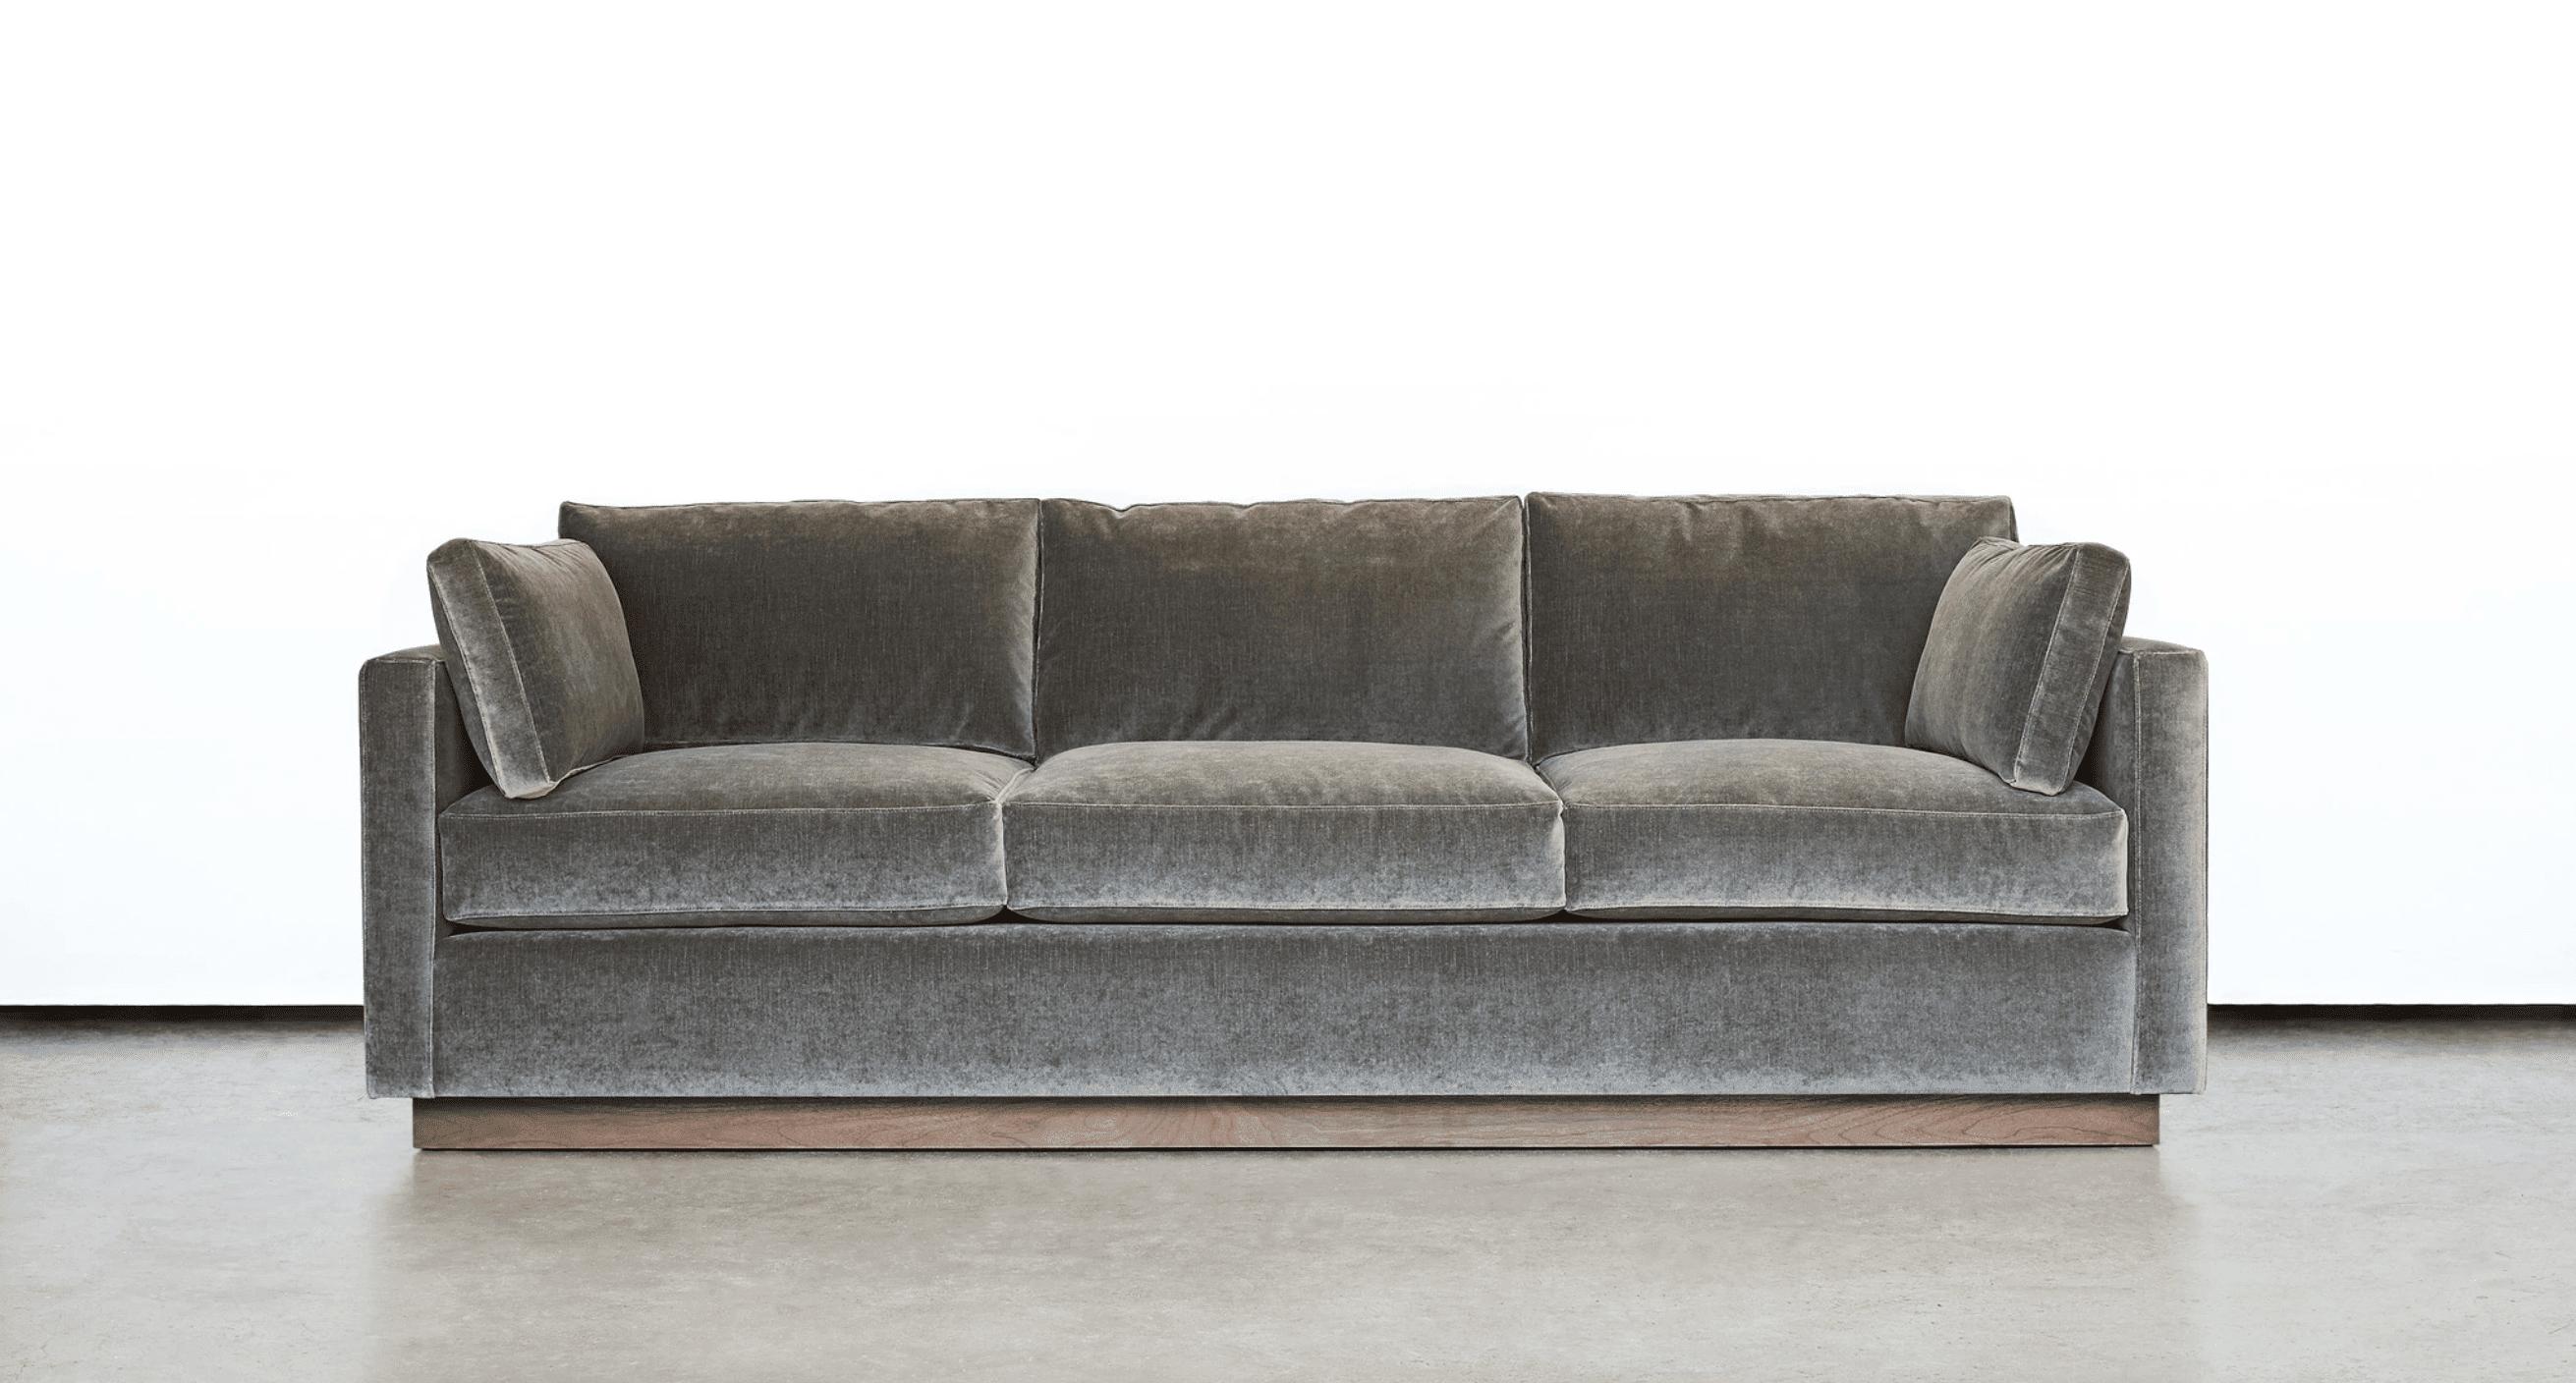 Hayvenhurst Sofa